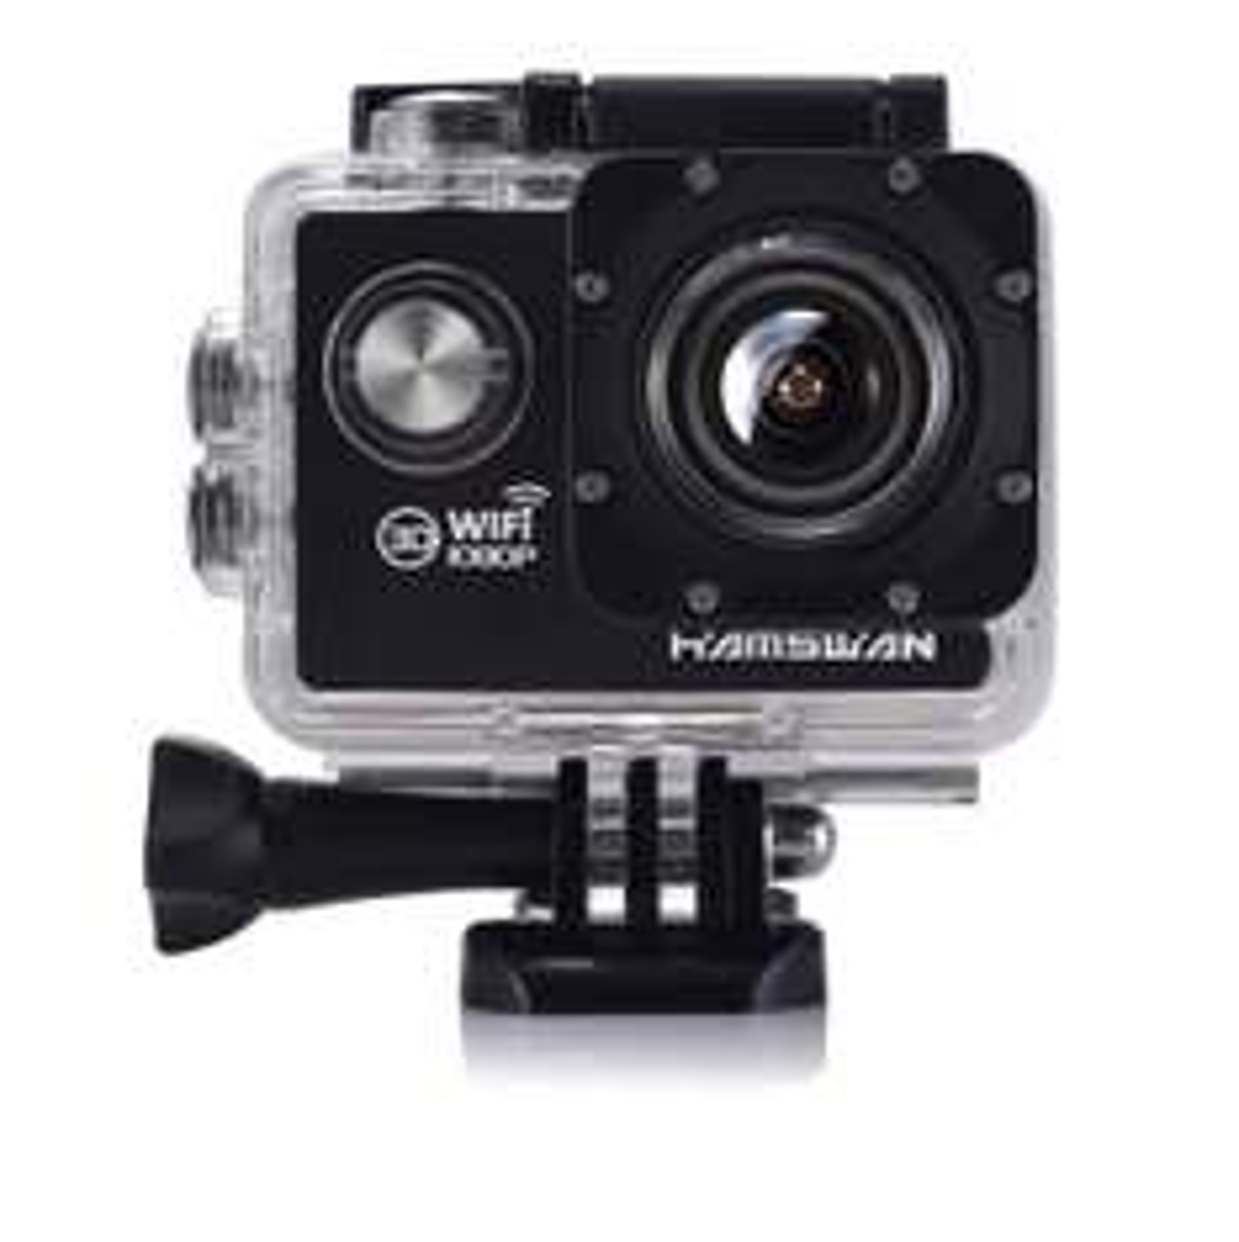 [Amazon] Hamswan Action Kamera 1080p